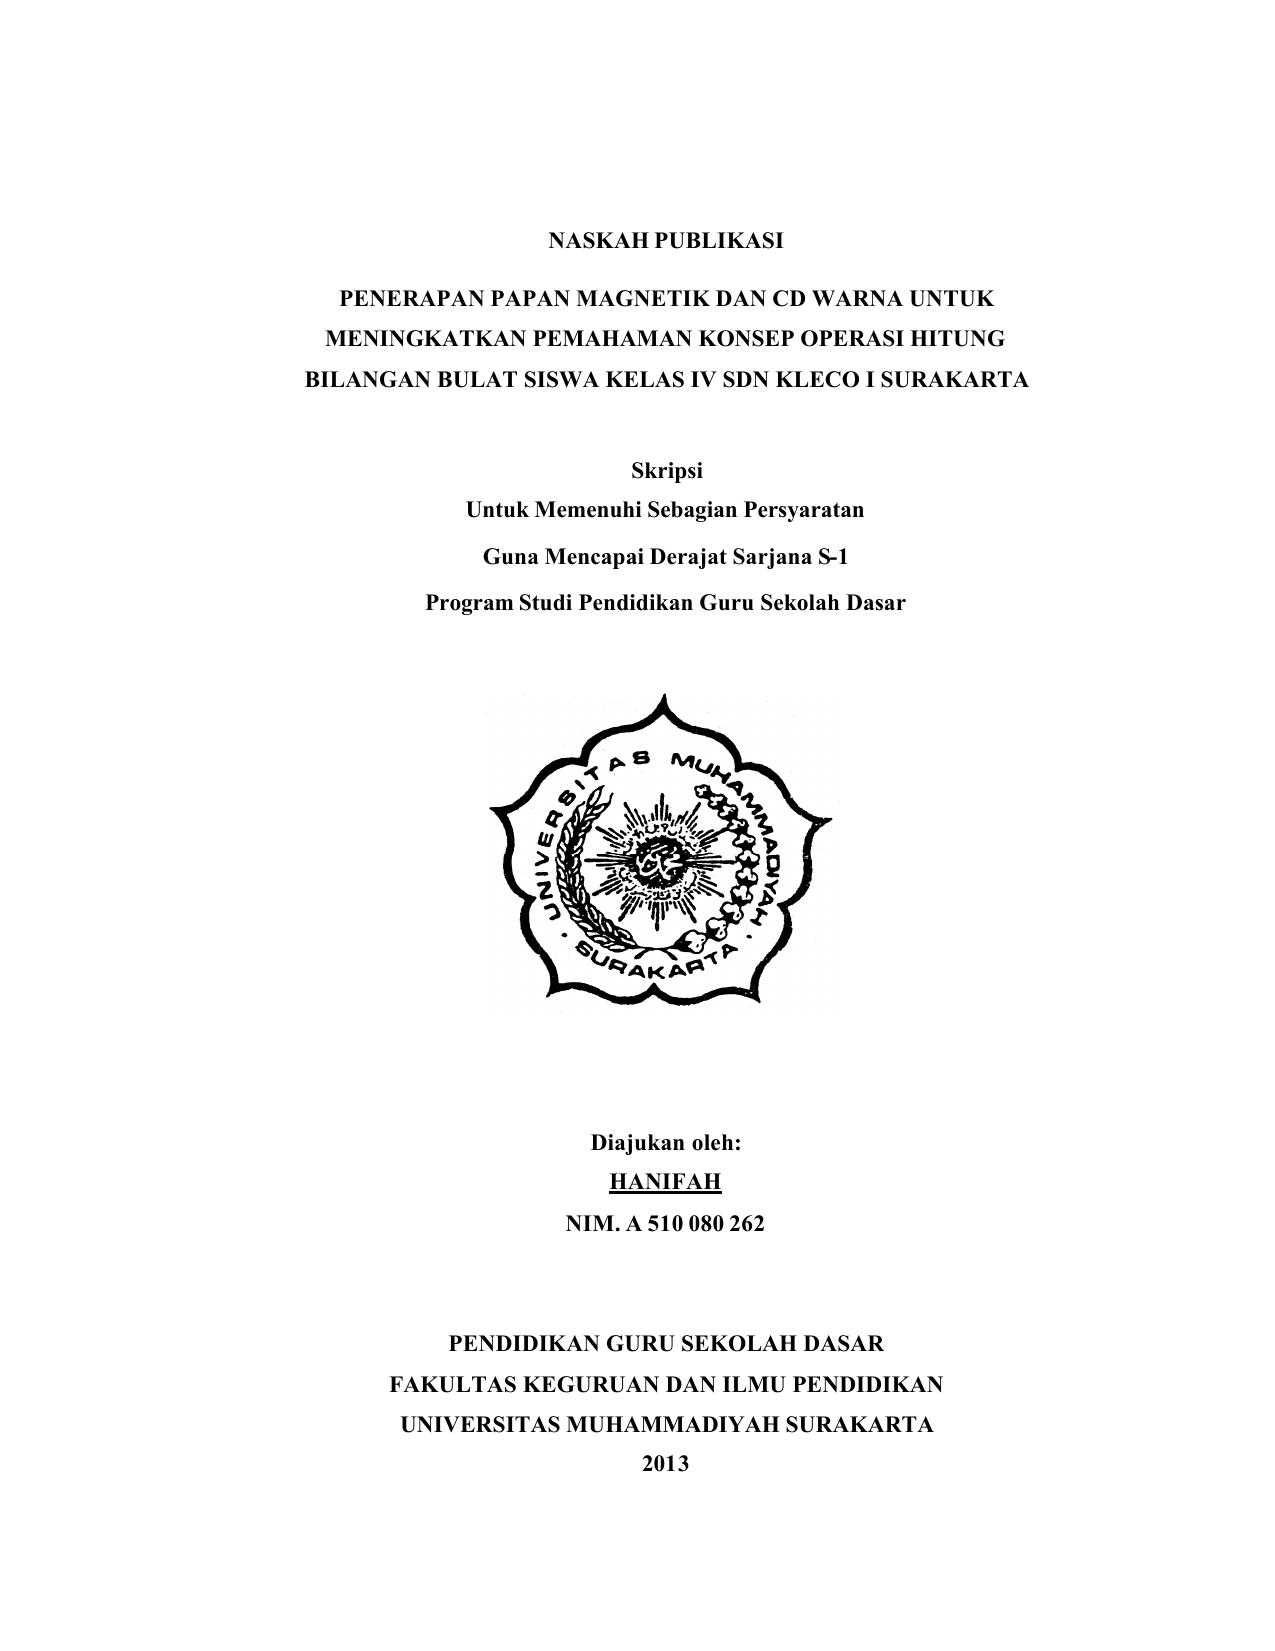 19 Naskah Publikasi Docx Universitas Muhammadiyah Surakarta